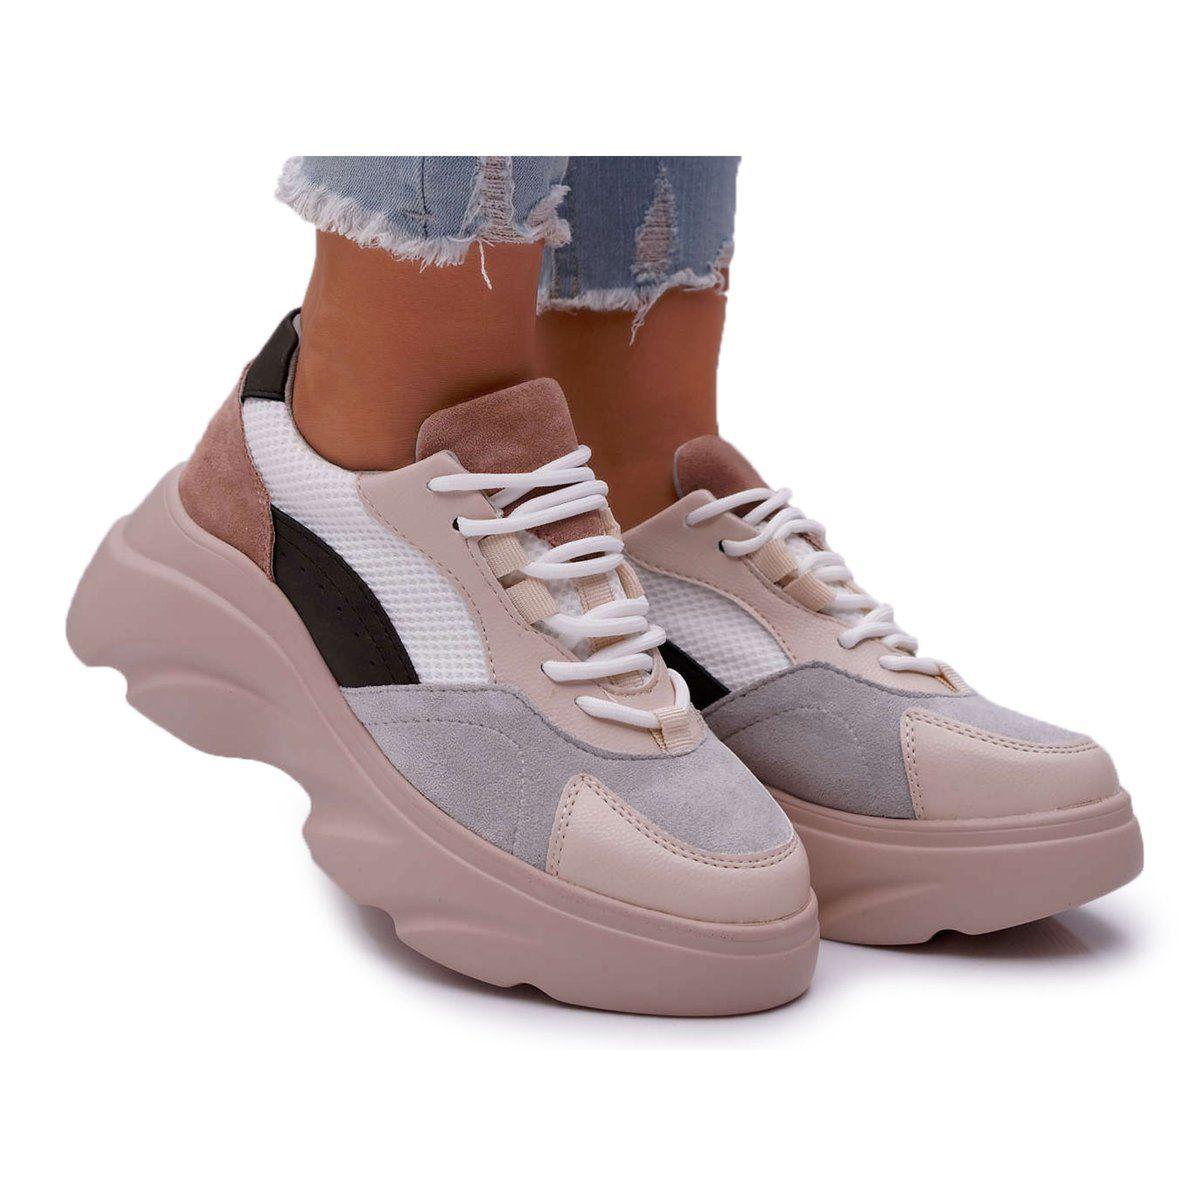 Sea Sportowe Damskie Buty Gruba Podeszwa Bezowe Cardamon Bezowy Brown Leather Sneakers Casual Sport Shoes Women Shoes